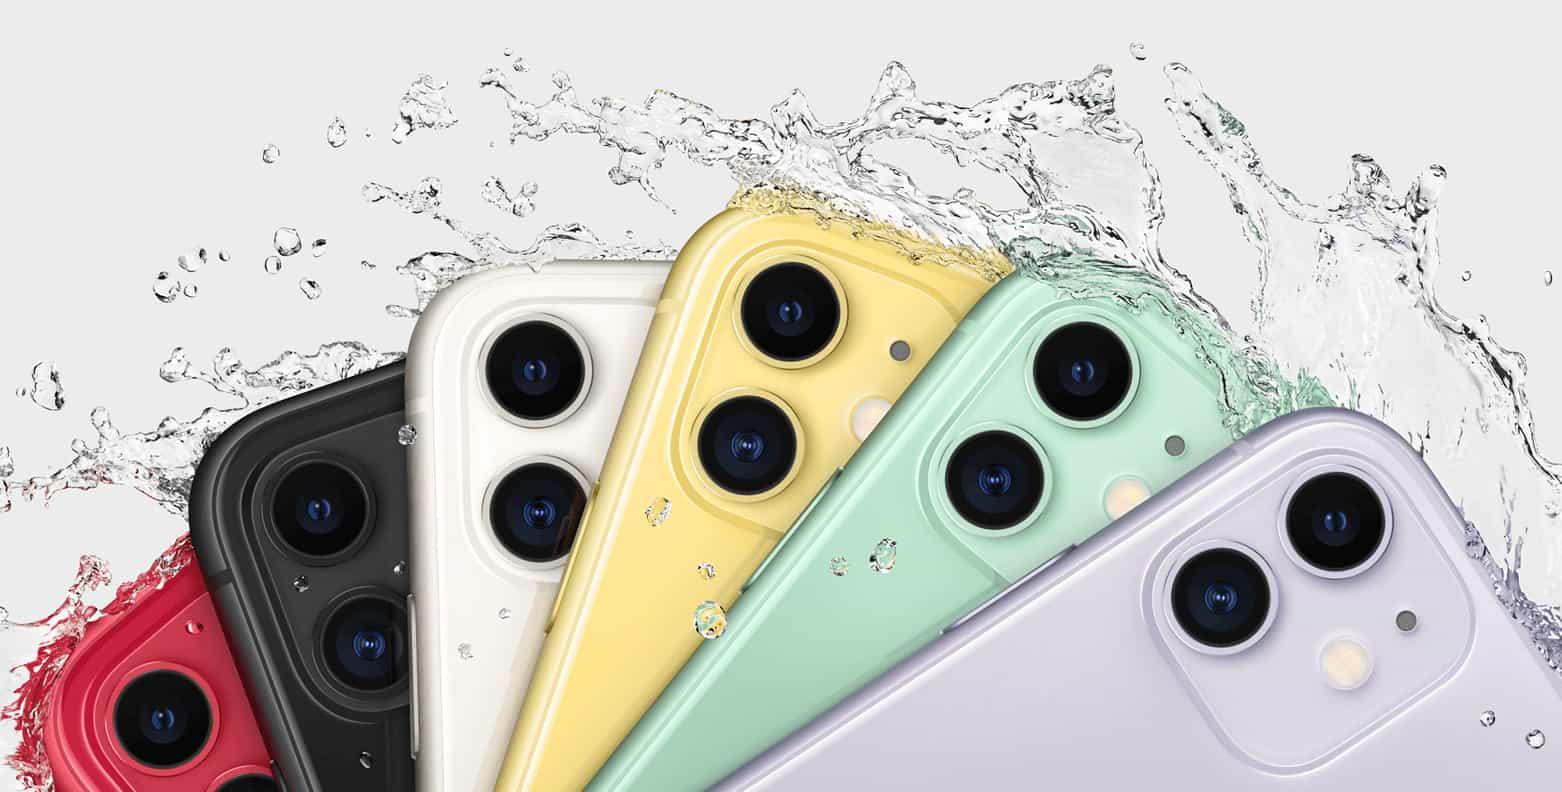 iPhone-11-5g